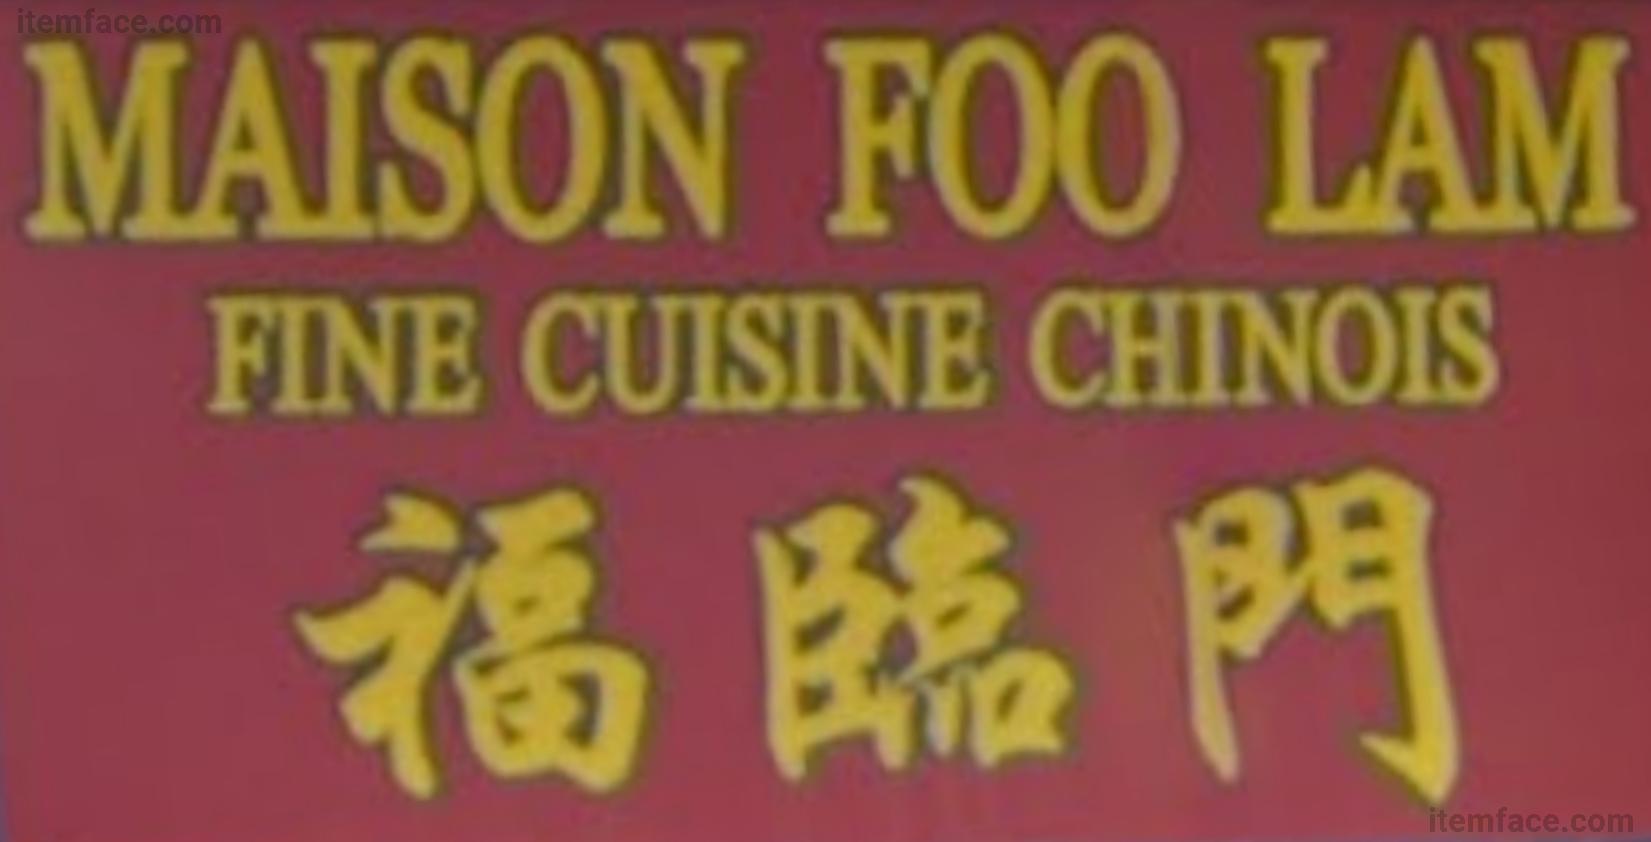 Maison Foo Lam - Restaurant